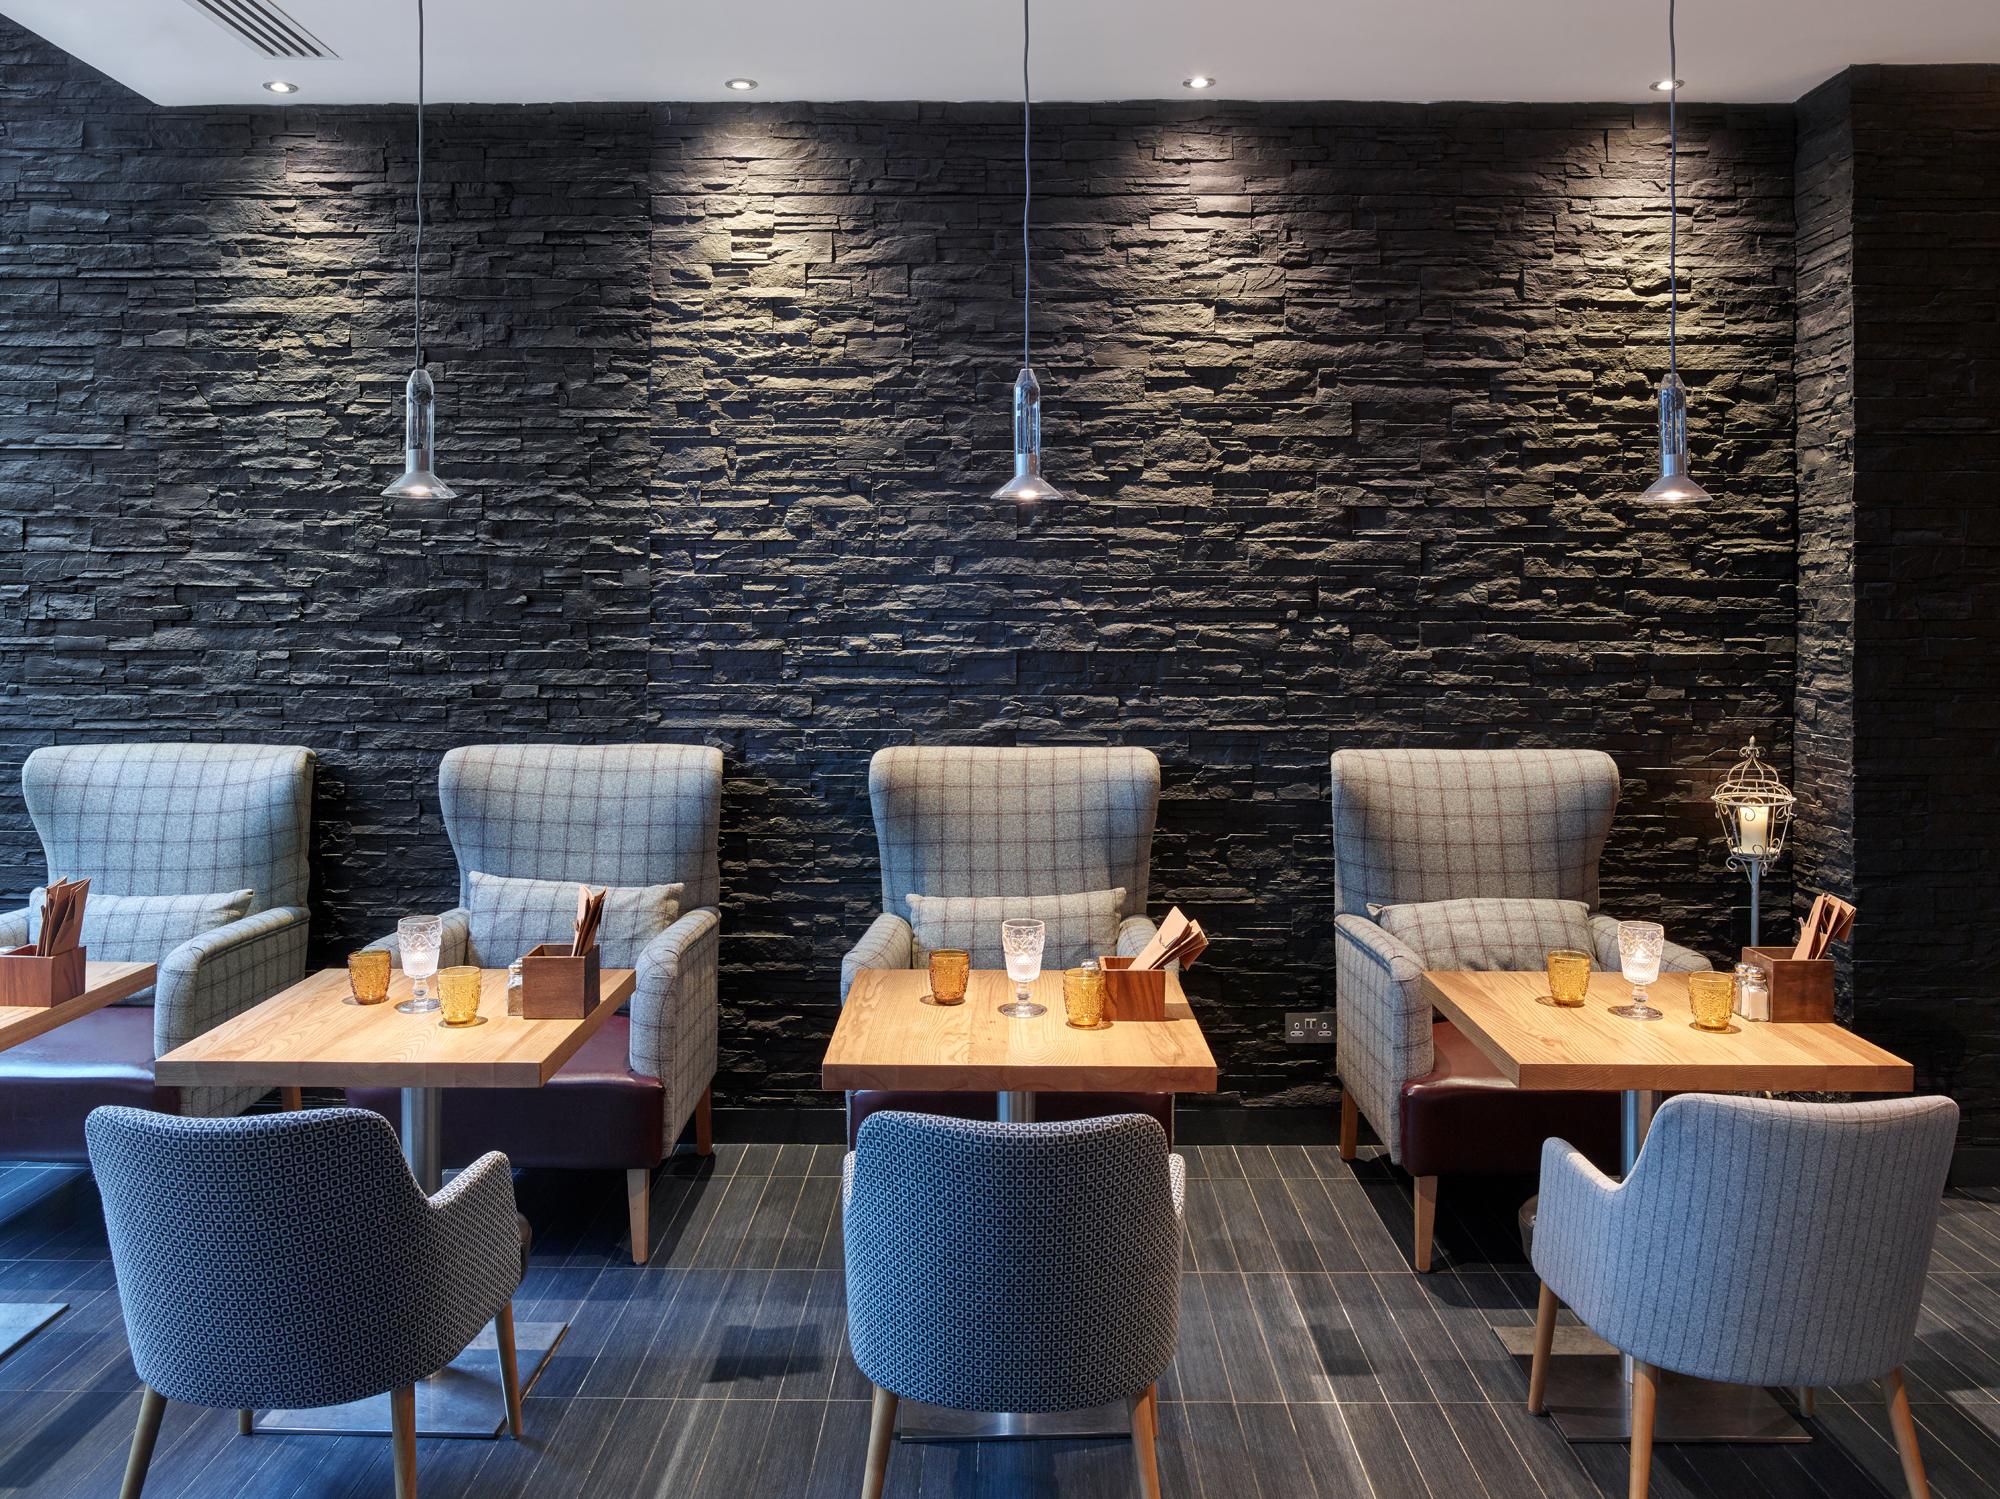 Отделка кафе в стиле каменном фото